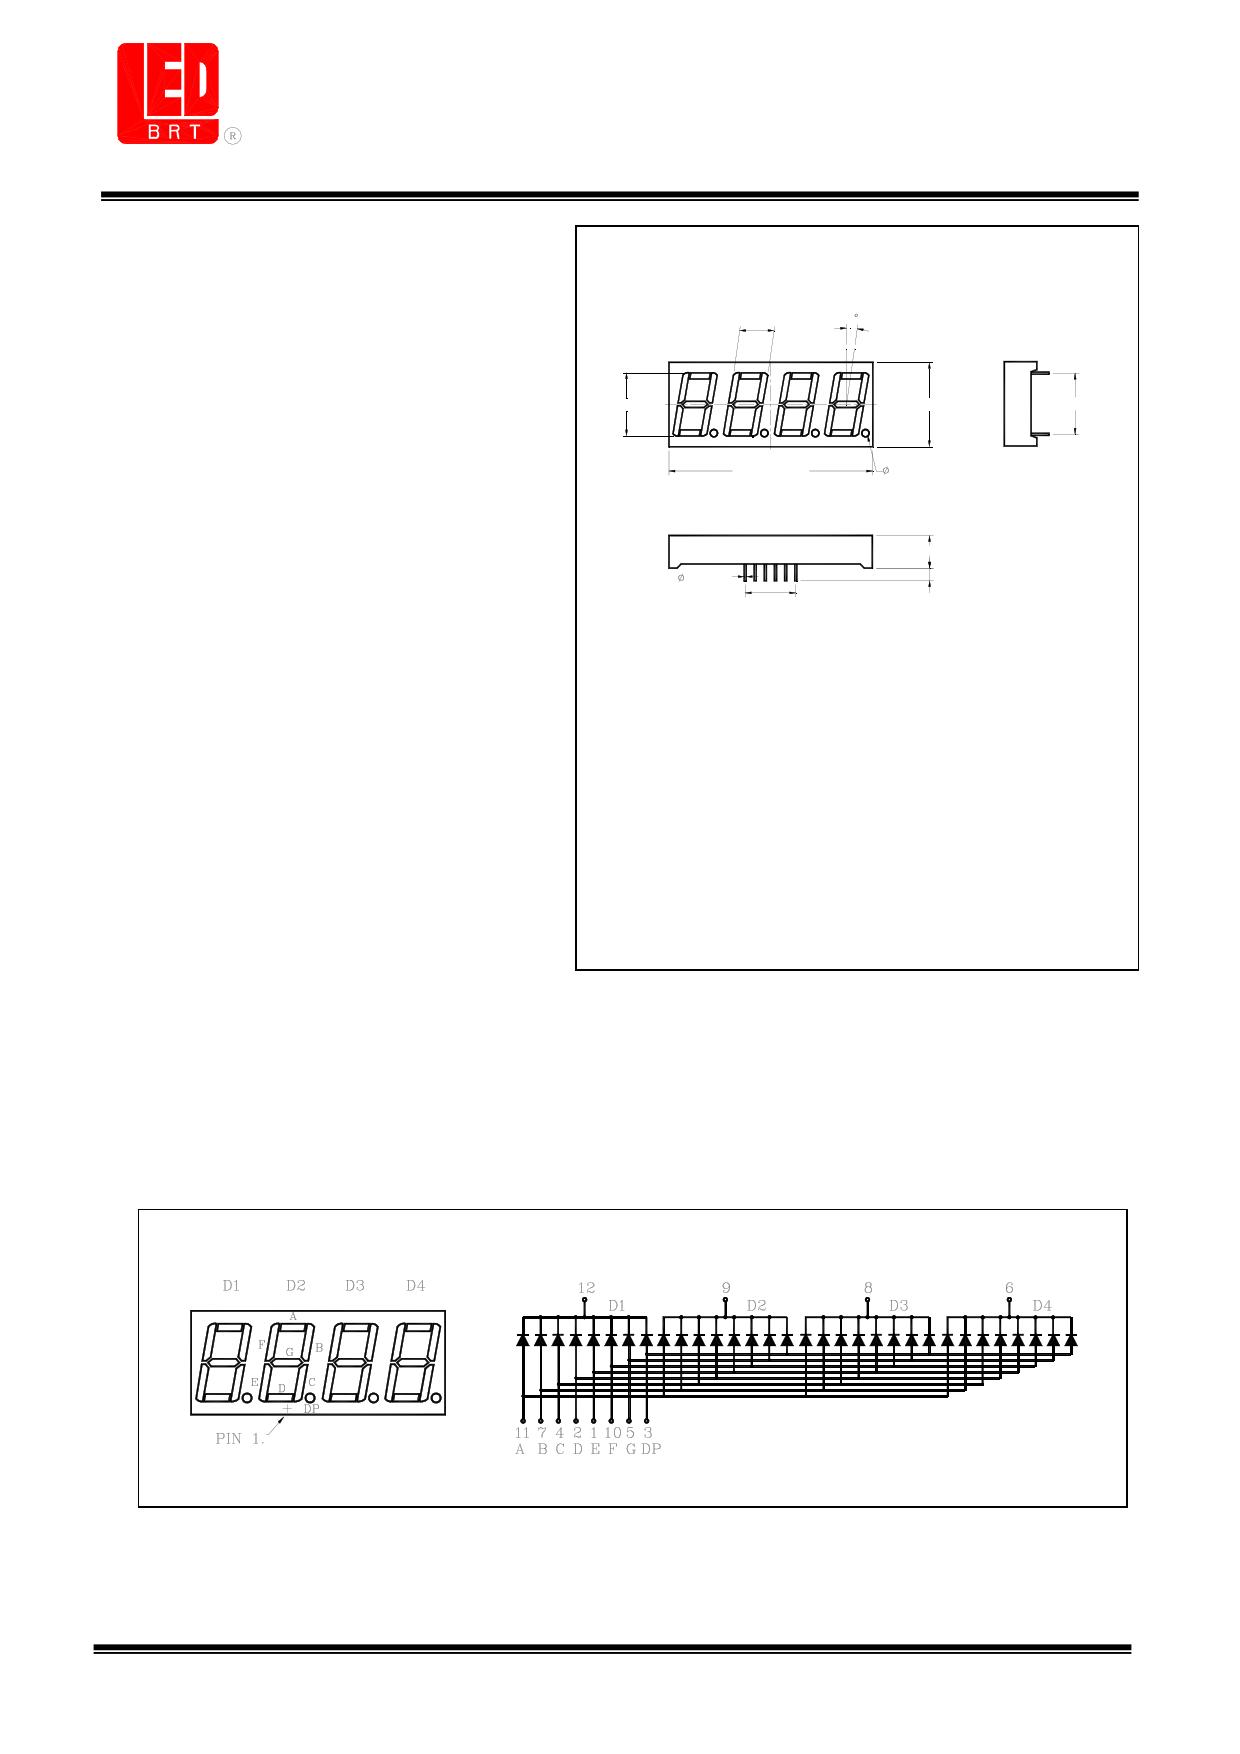 lcd display 16x4 datasheet pdf